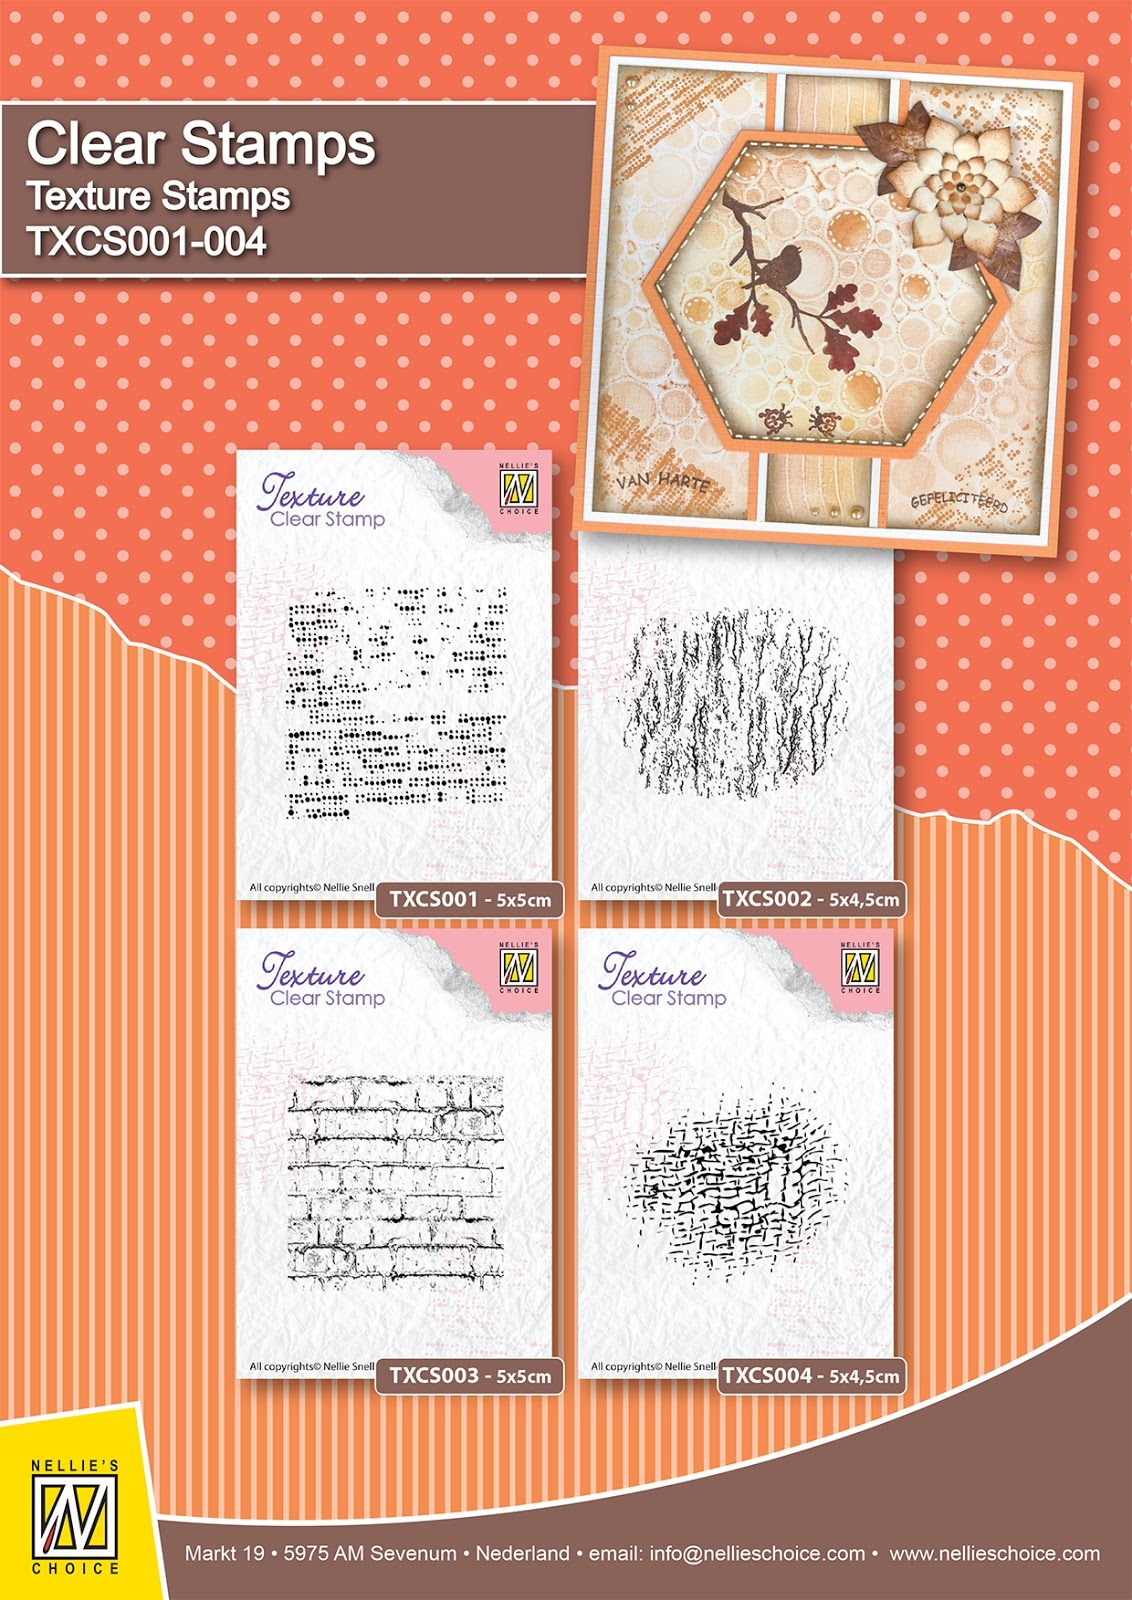 Texture Stamps